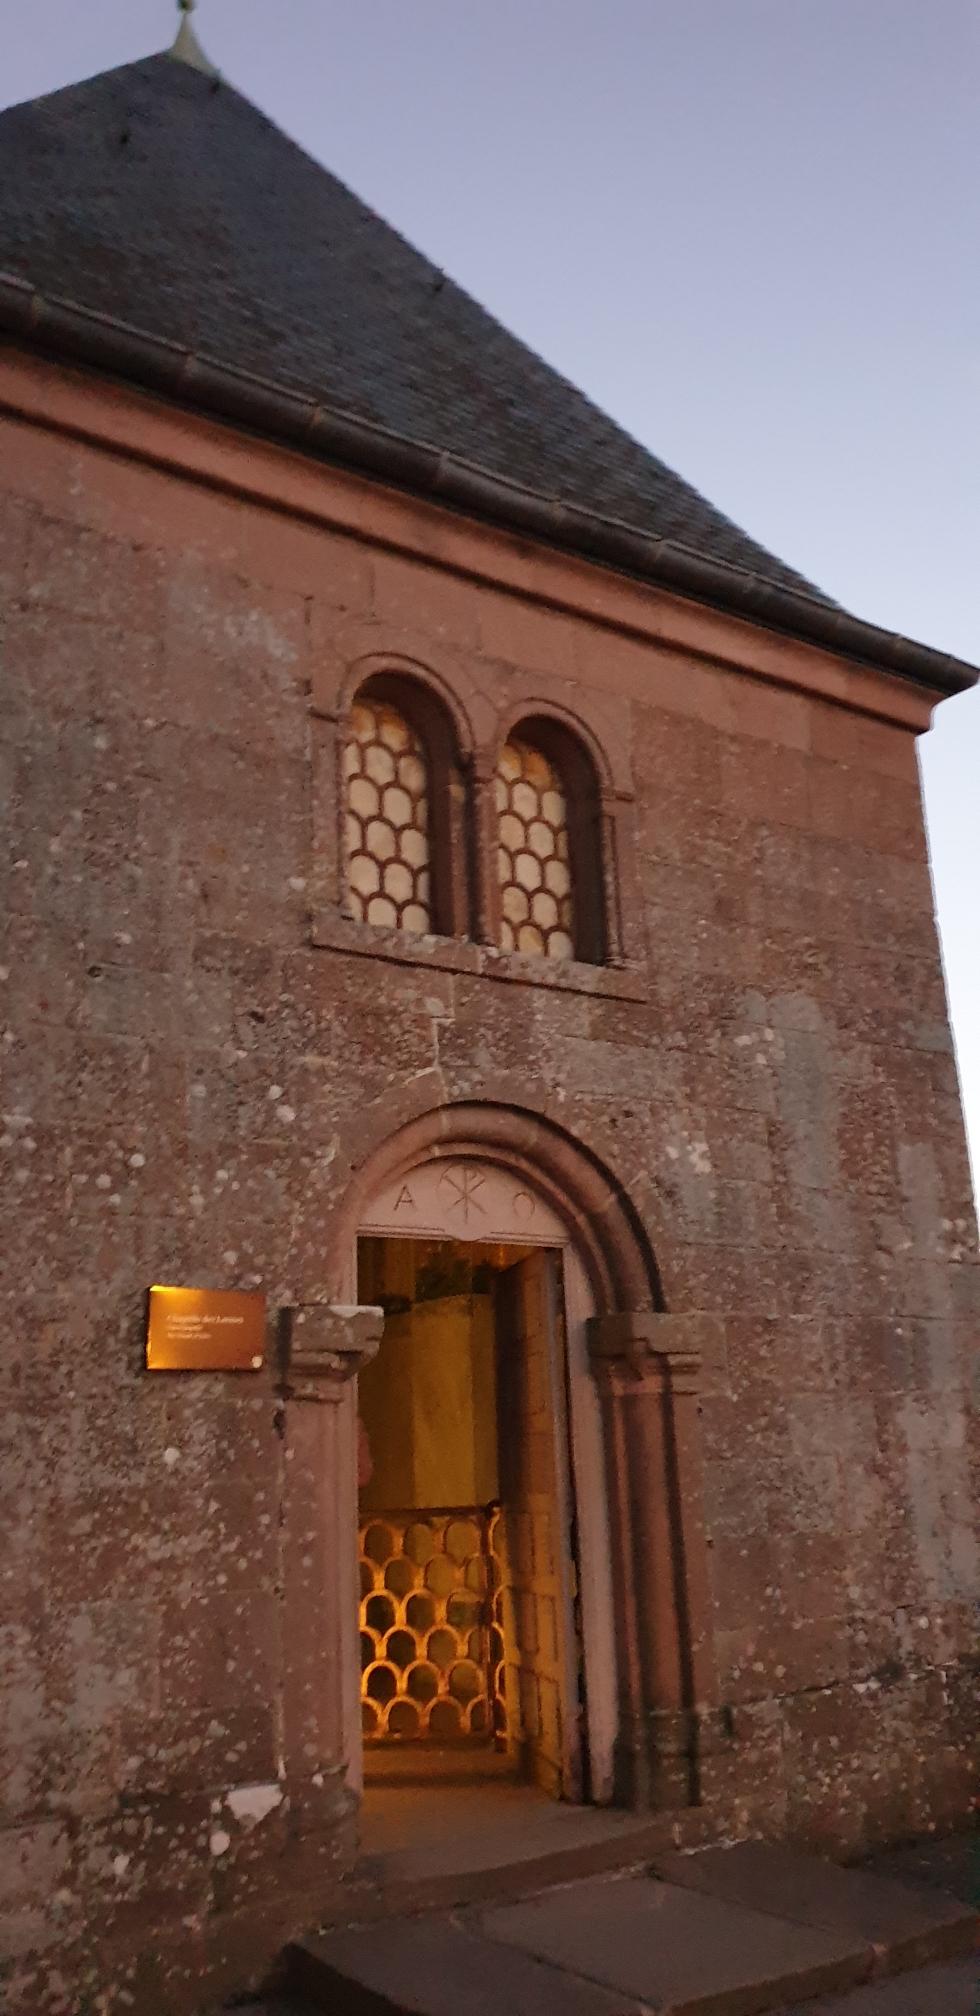 Geöffnete Tränenkapelle